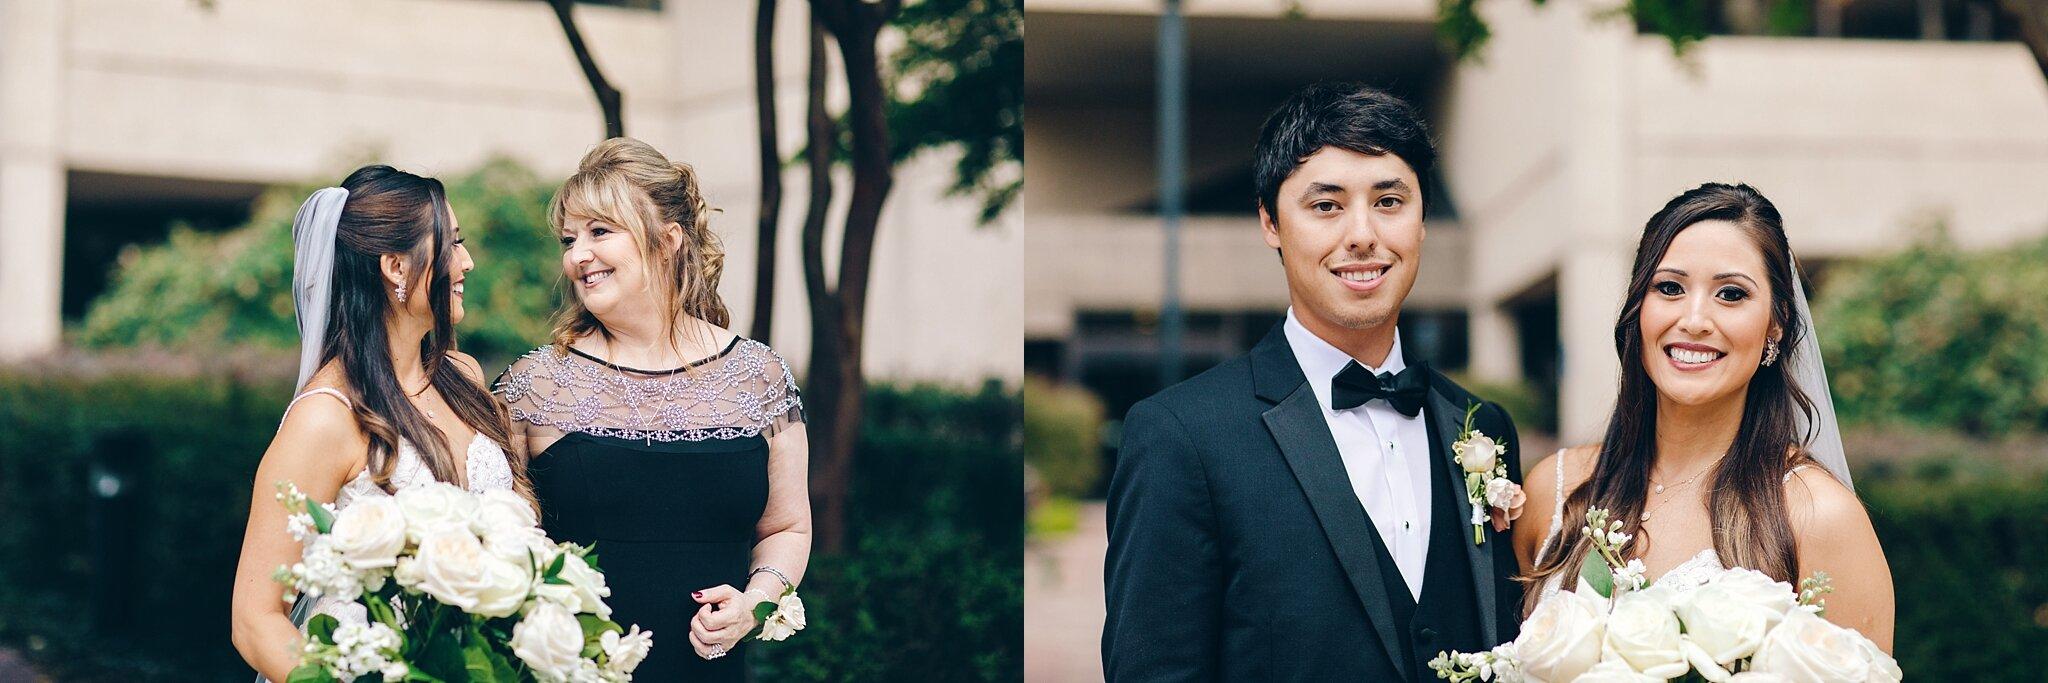 patrick-henry-ballroom-wedding-roanoke_0511.jpg